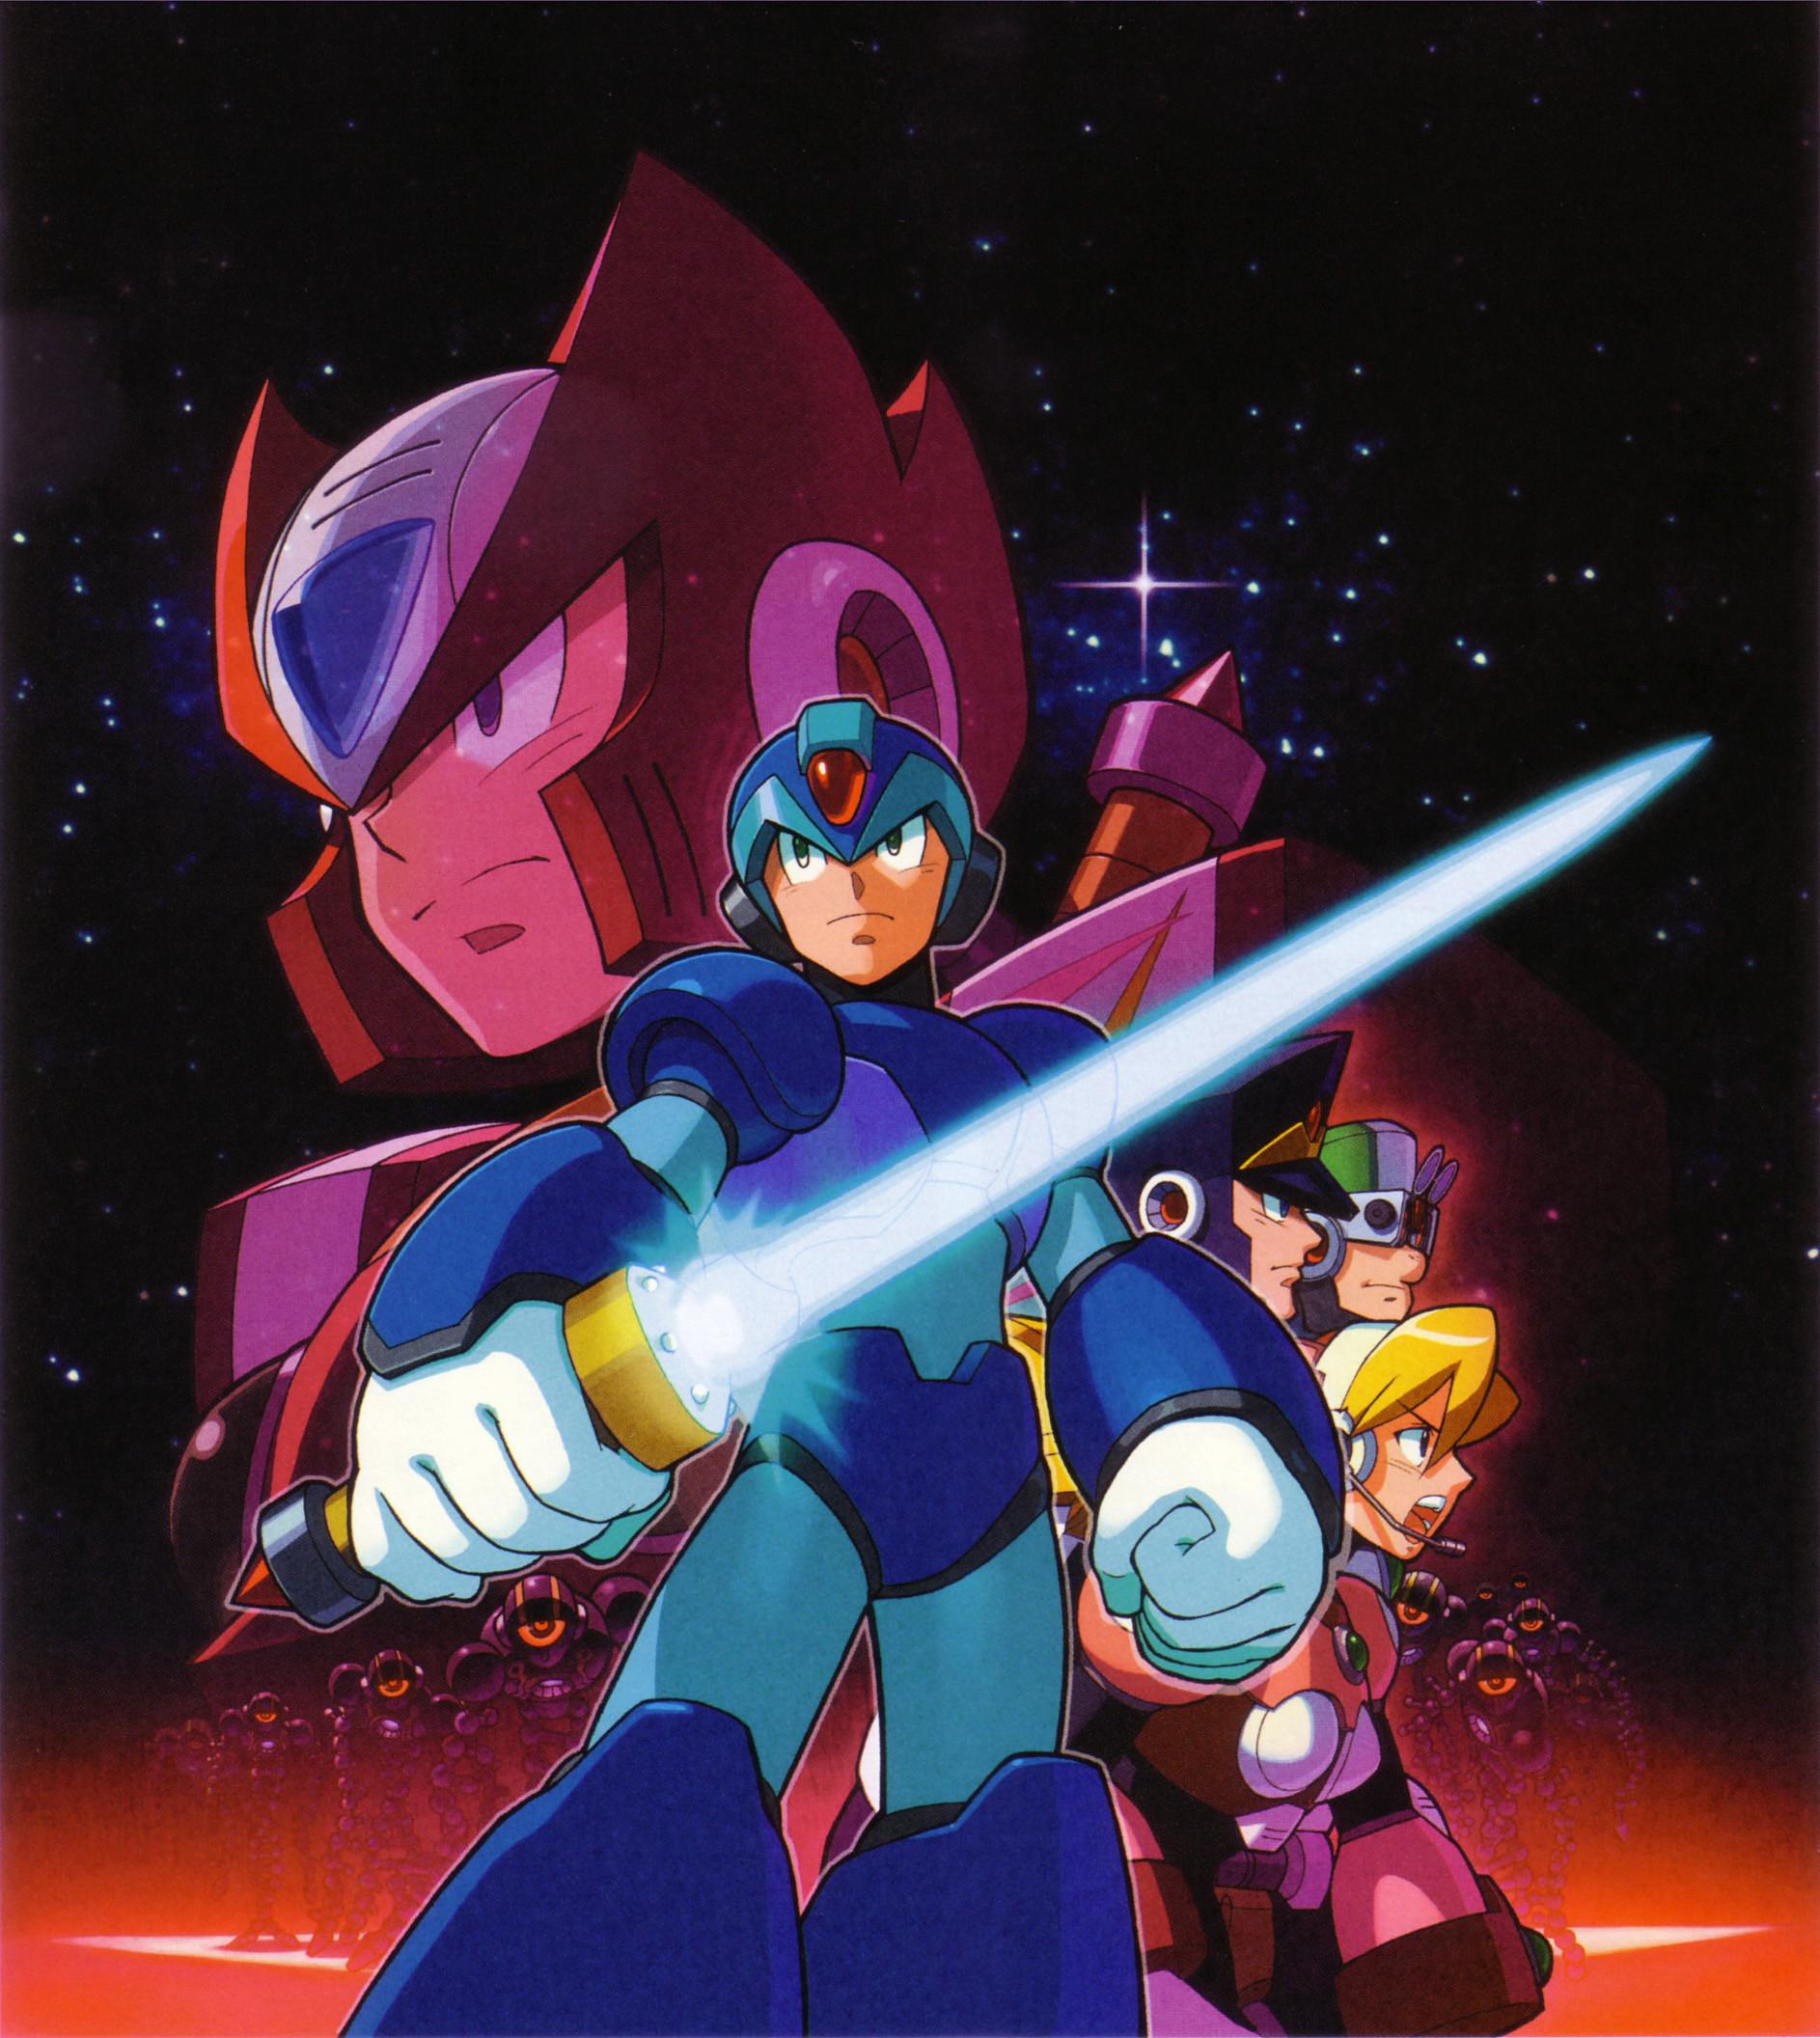 Megaman hd wallpapers 66 images - Megaman wikia ...